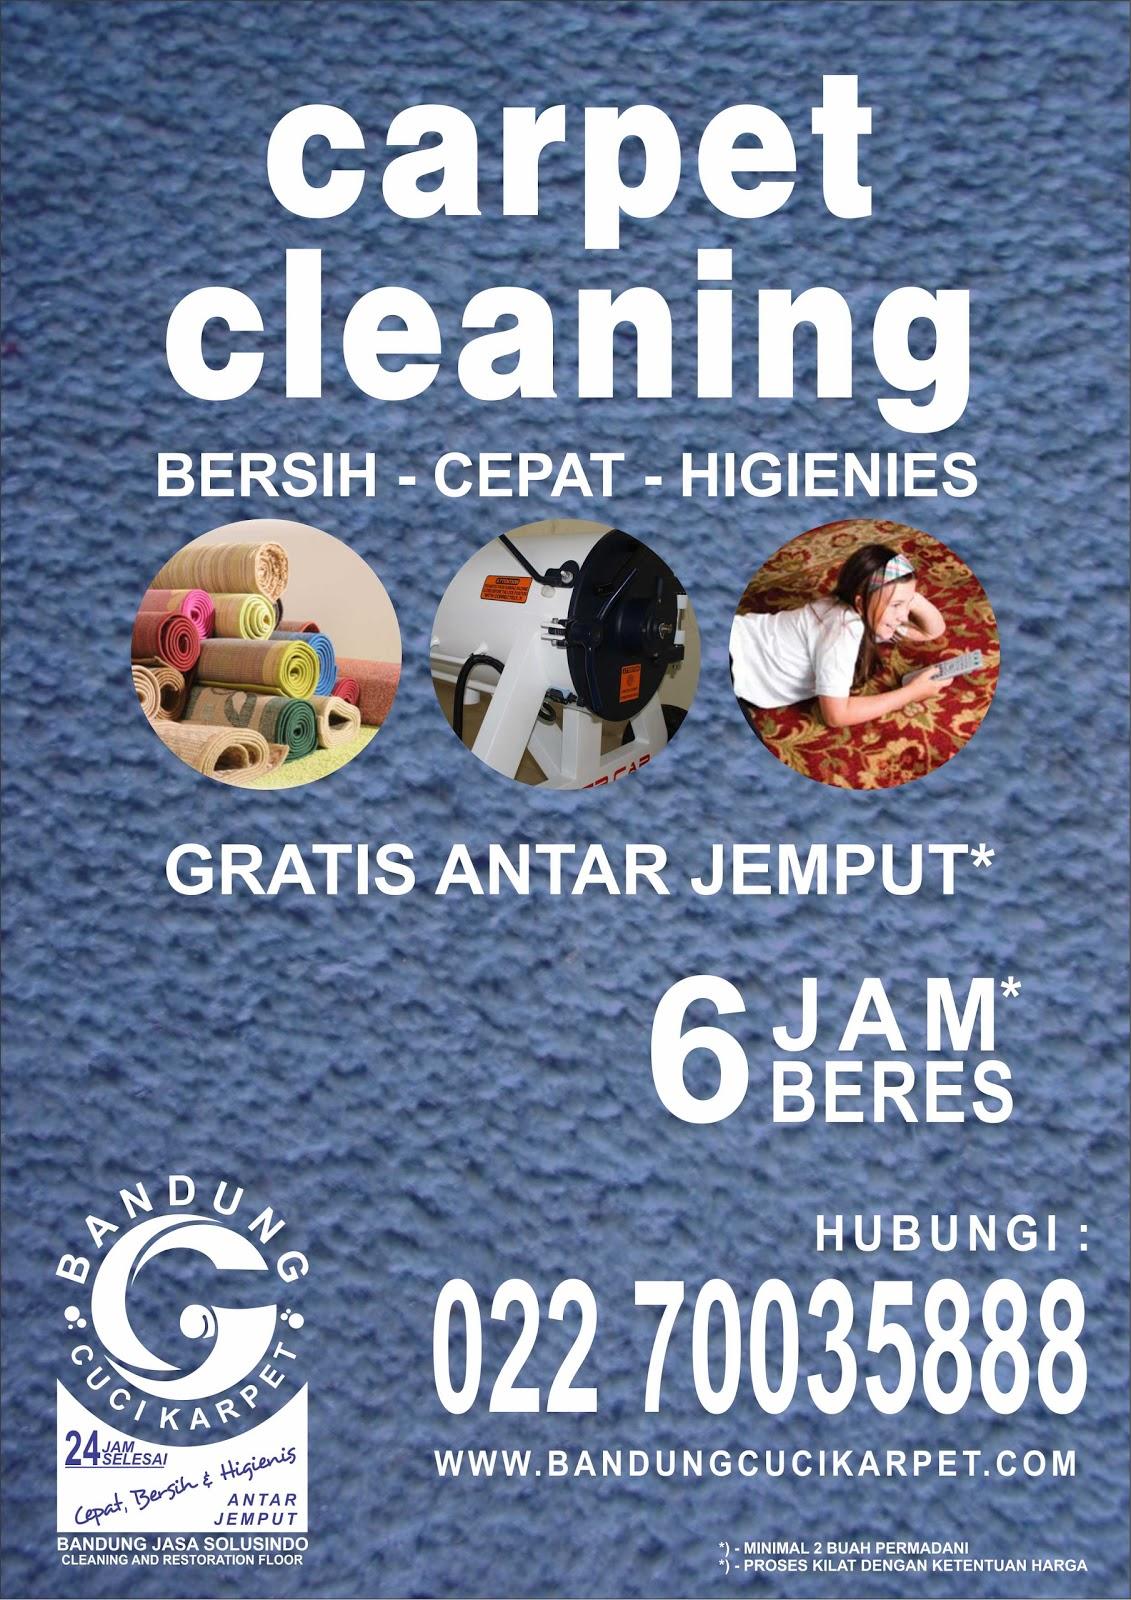 Cuci Karpet di Bandung Jemput Cuci Karpet Bandung